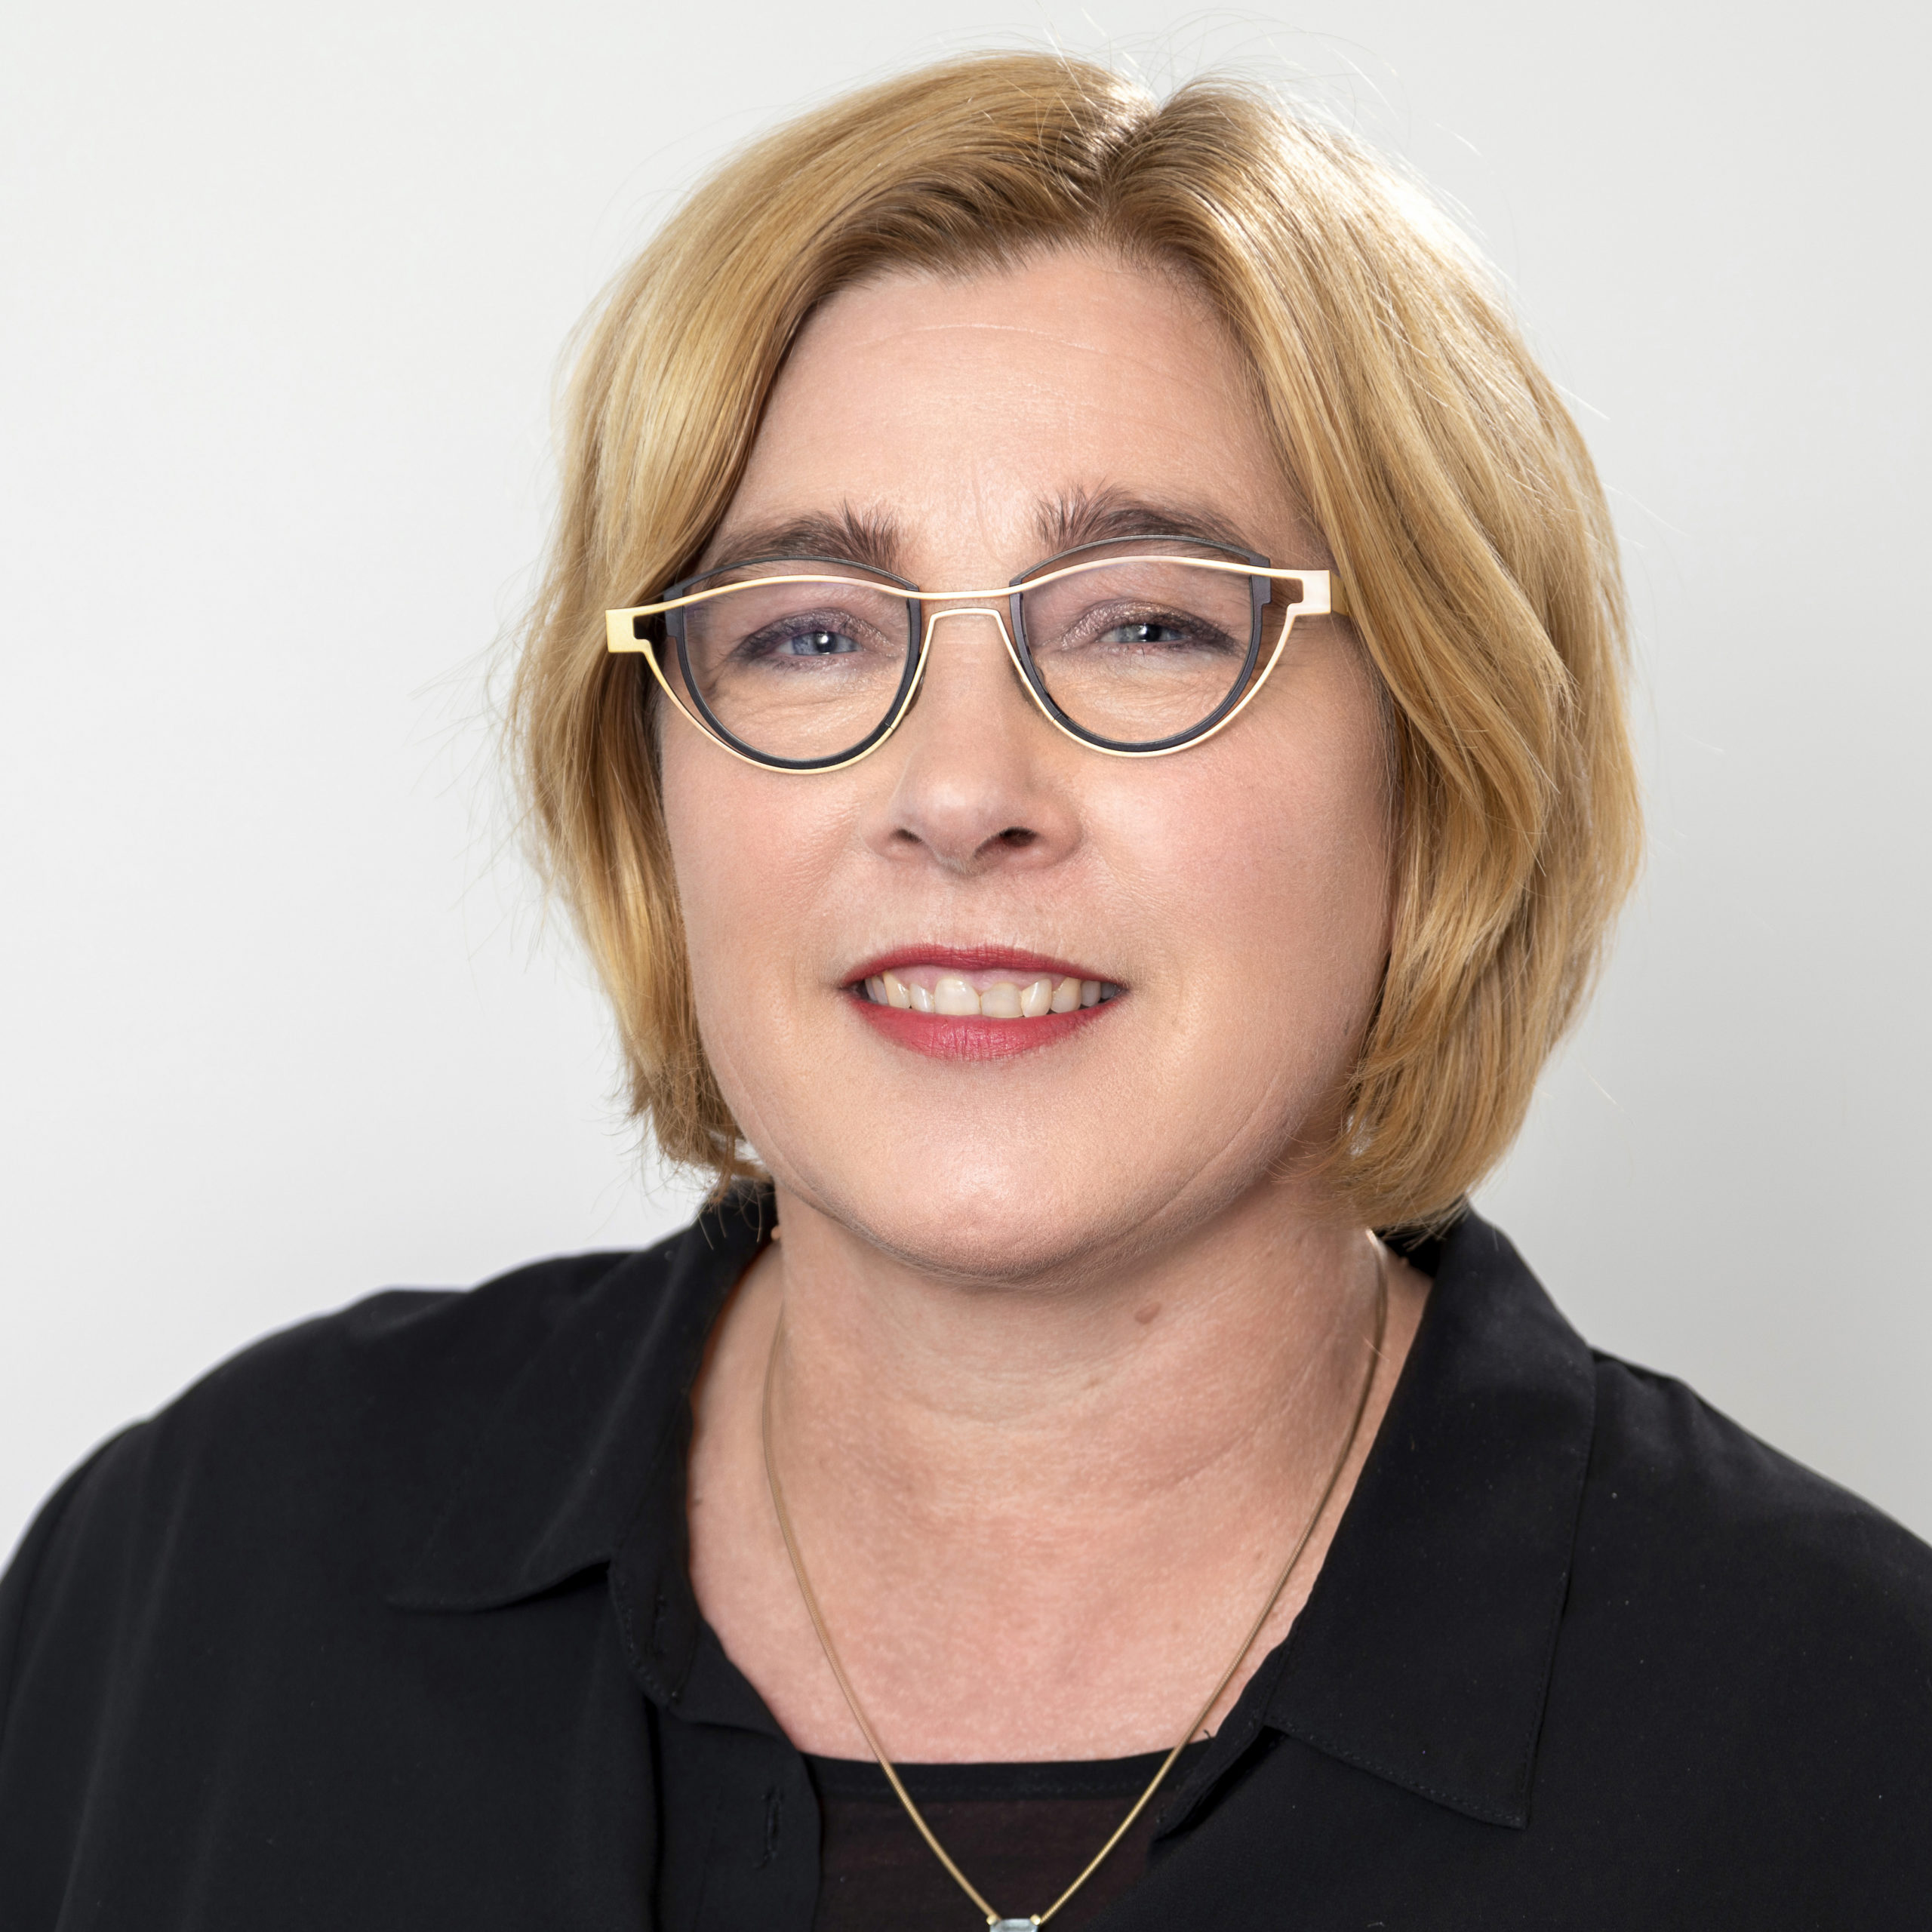 Manon Mostert Prodeba zorgprofessional